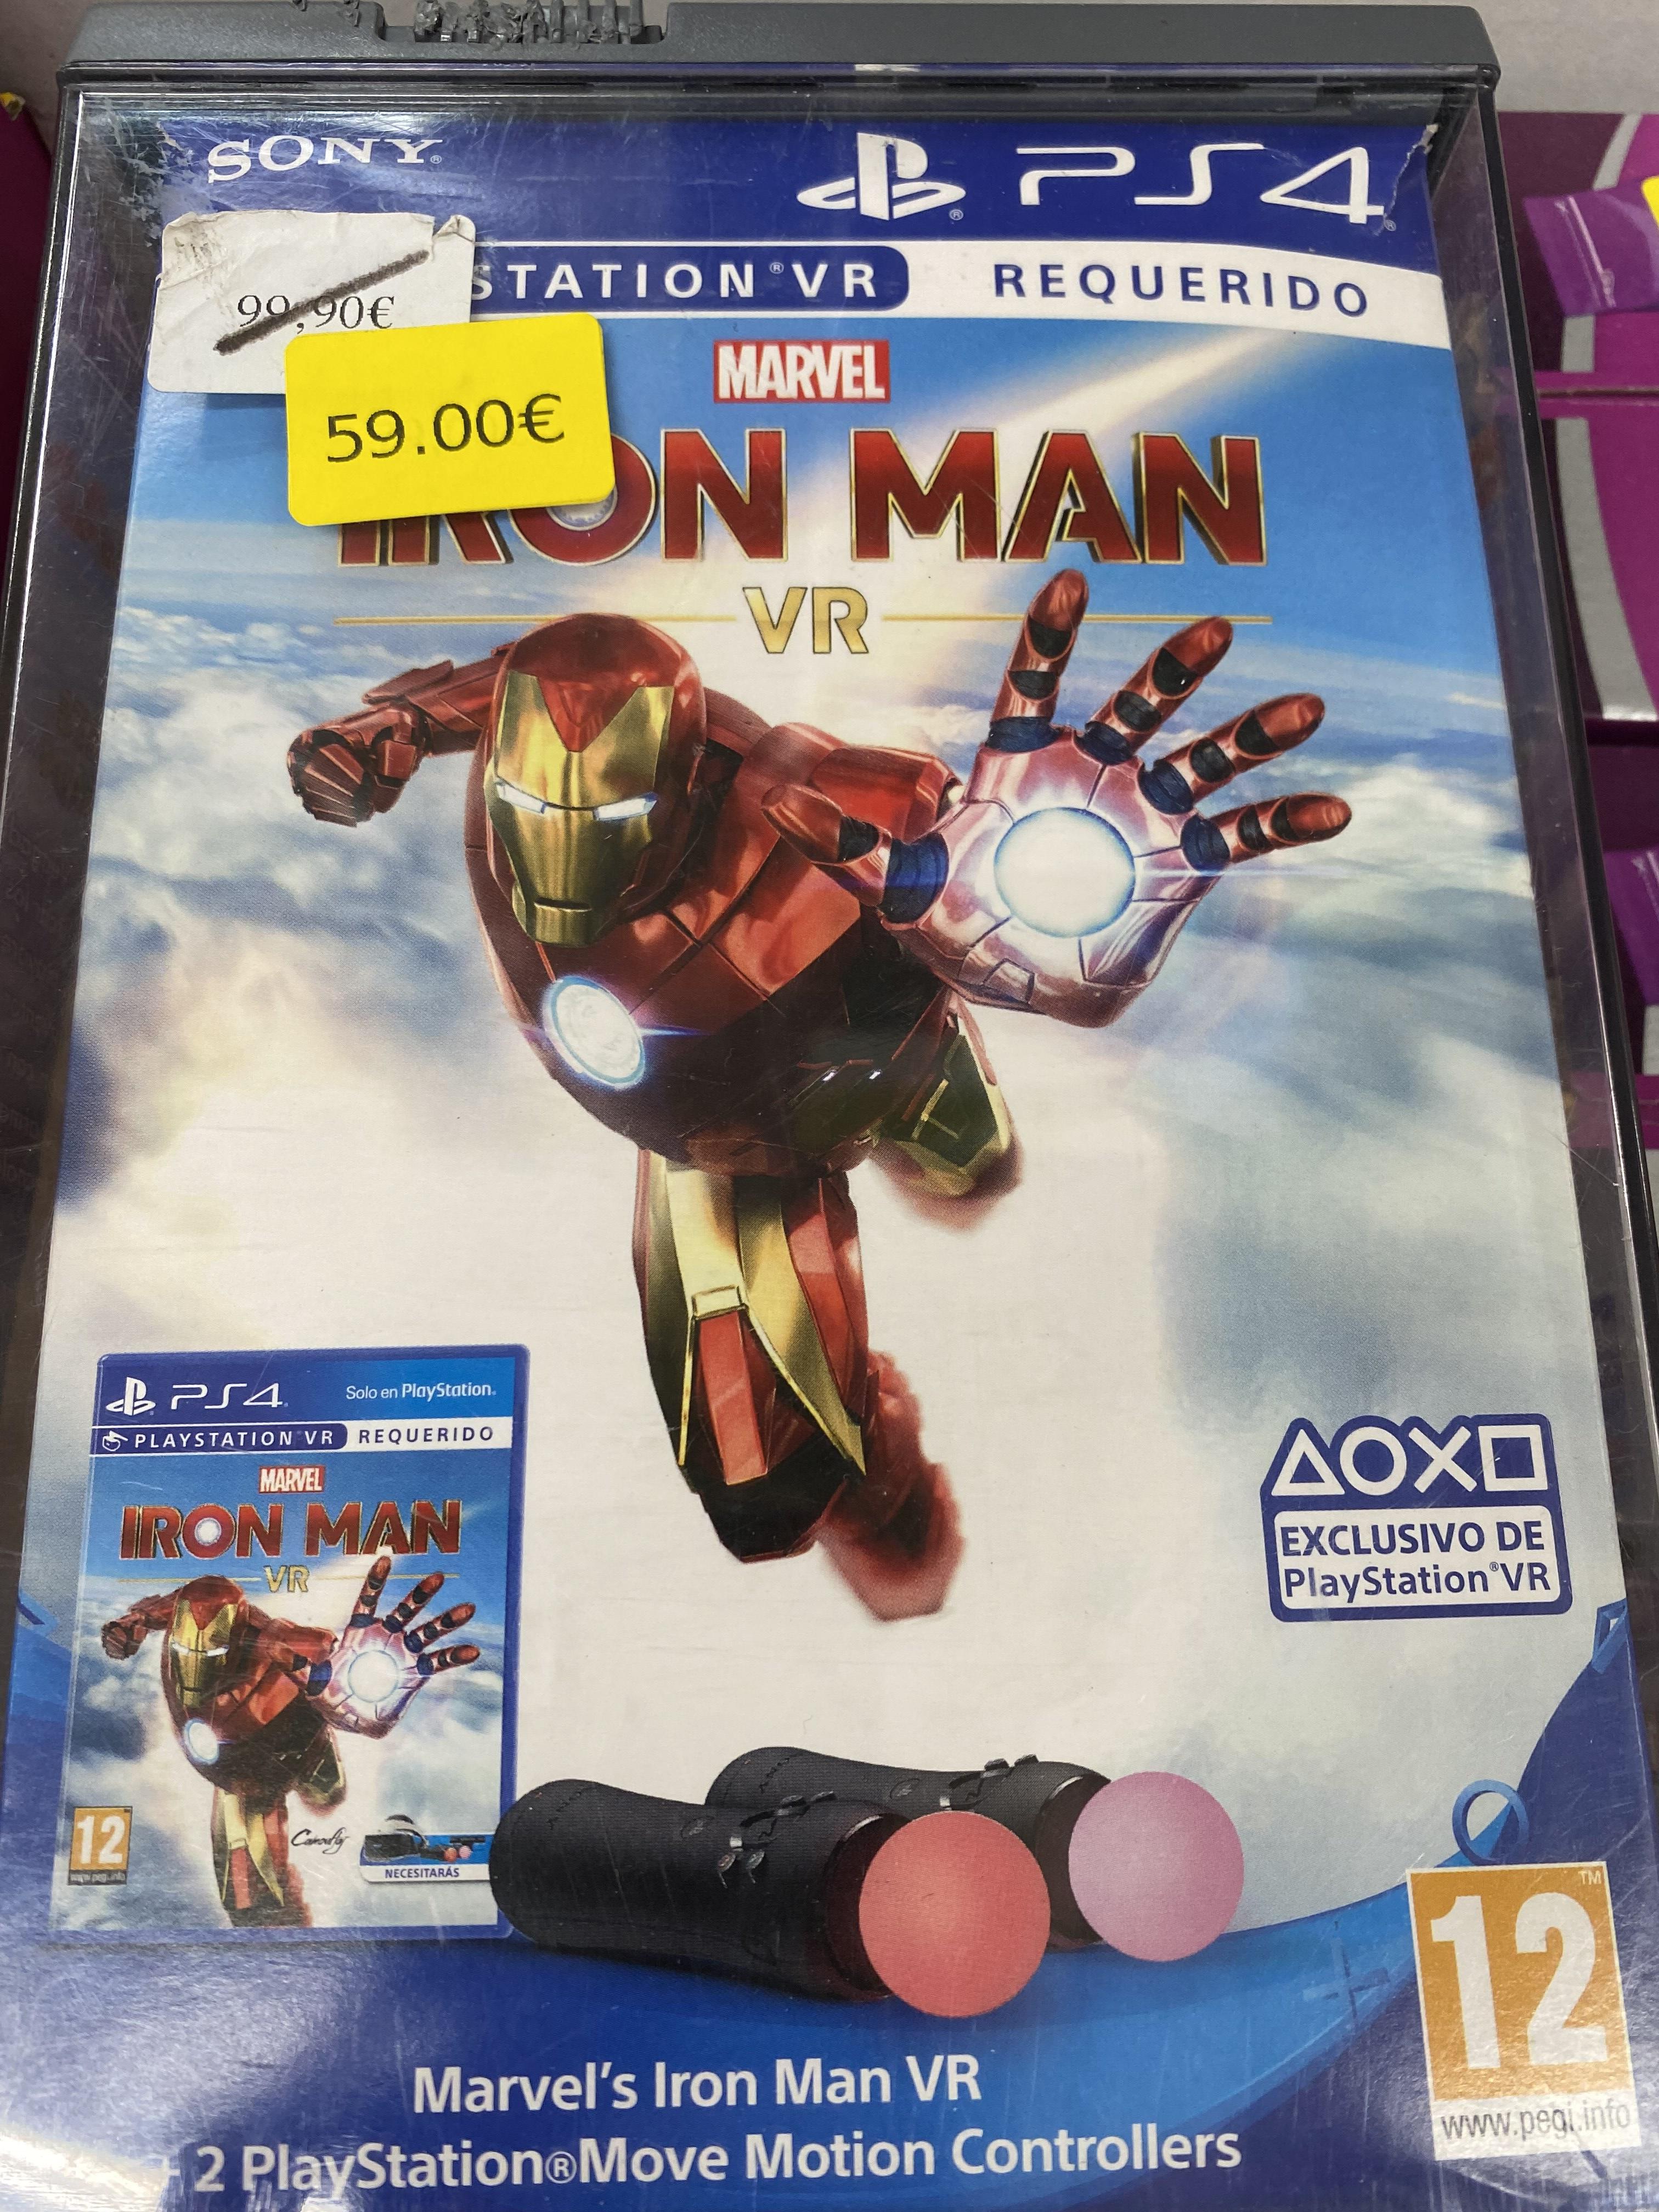 Marvel's Iron Man VR PS4 + 2 MOVE